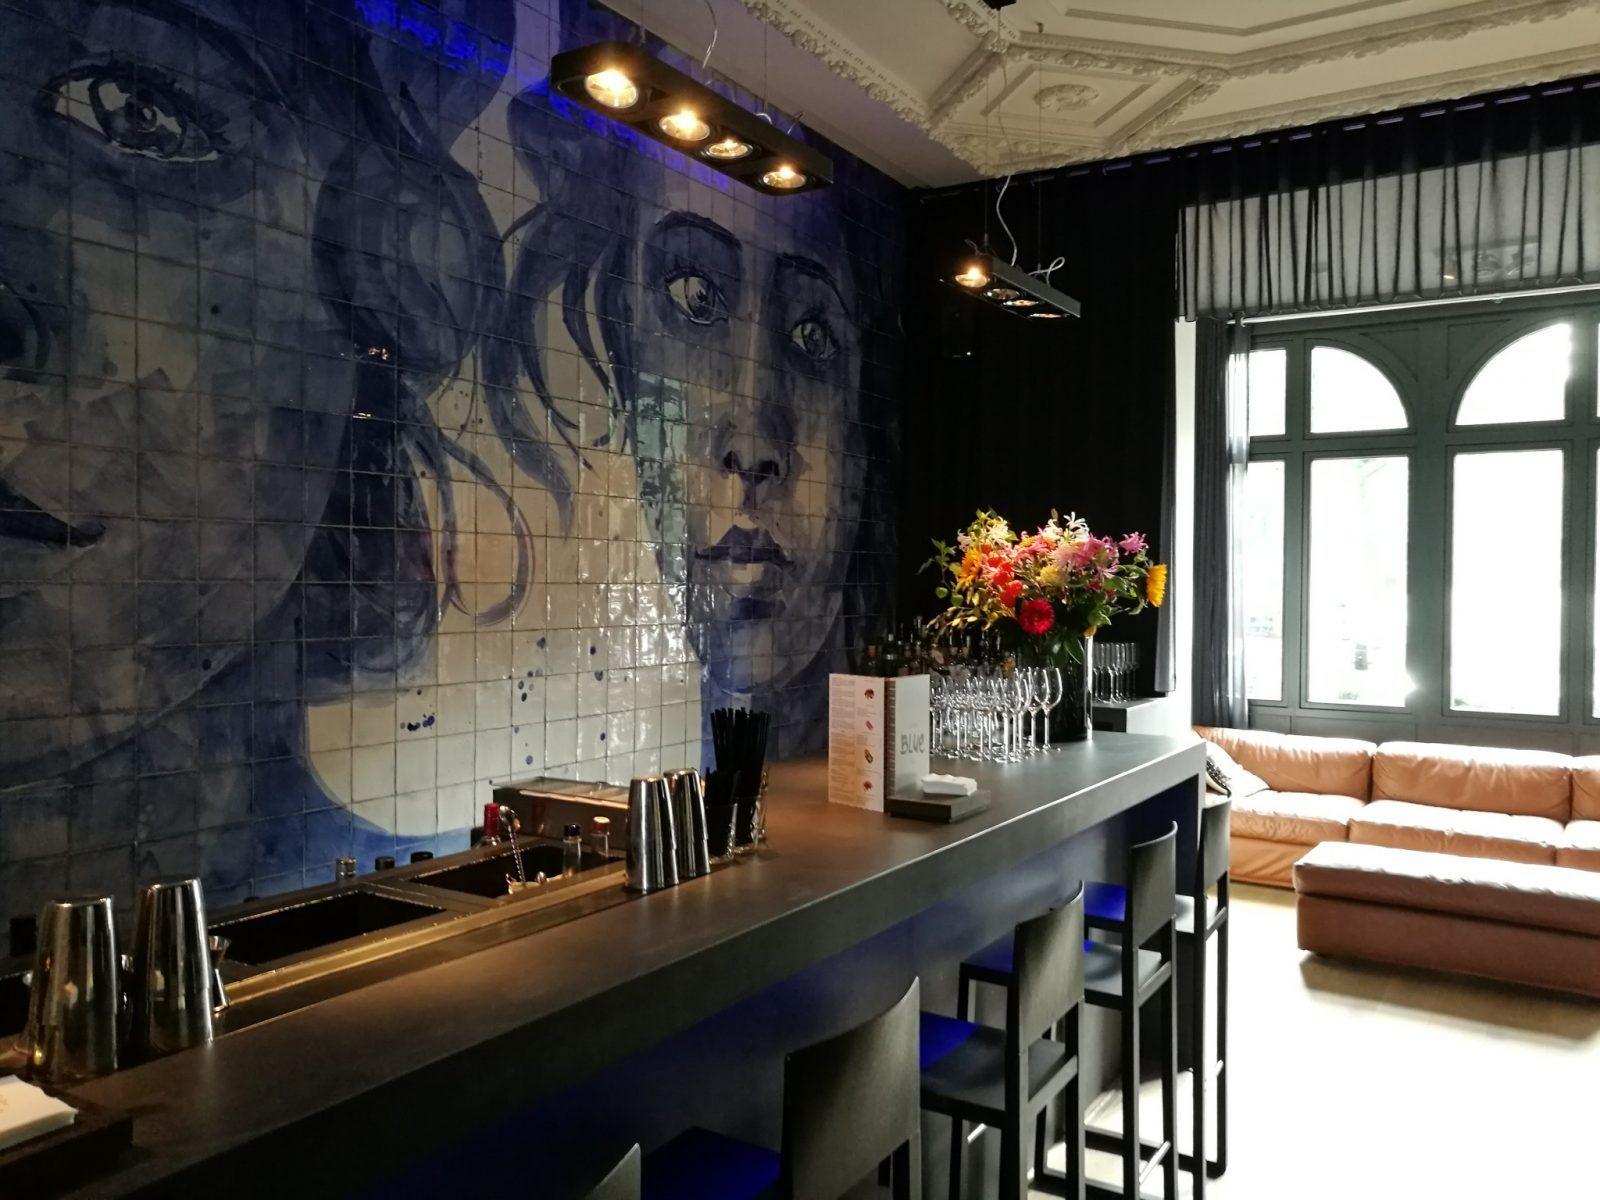 hotel blue, nijmegen, citytrip, hotspot, karijn visser